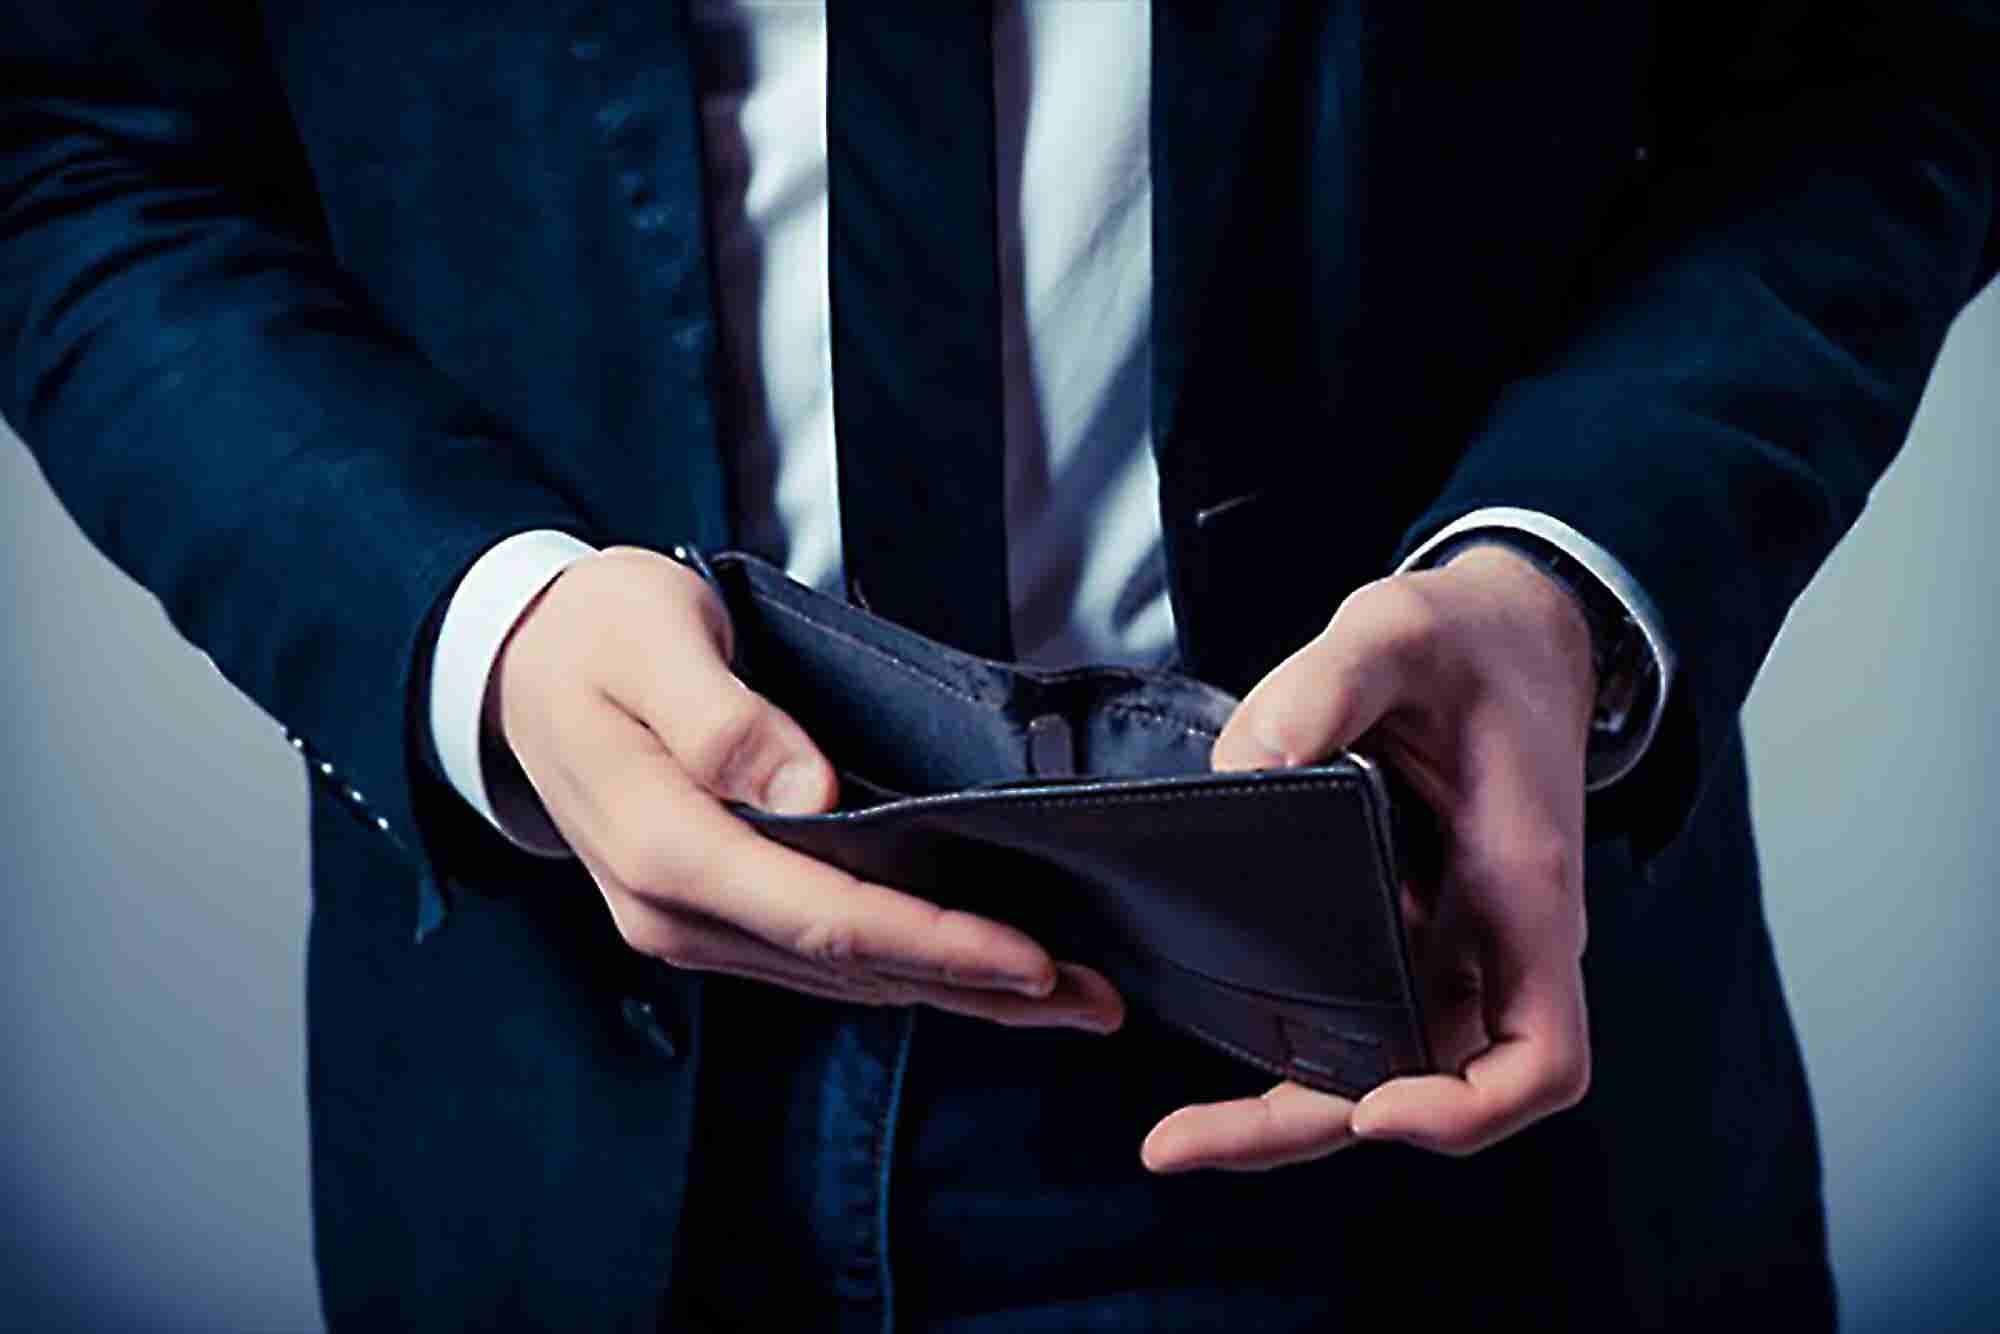 Entrepreneurs Find Hiring a Payroll Service Brings Perks